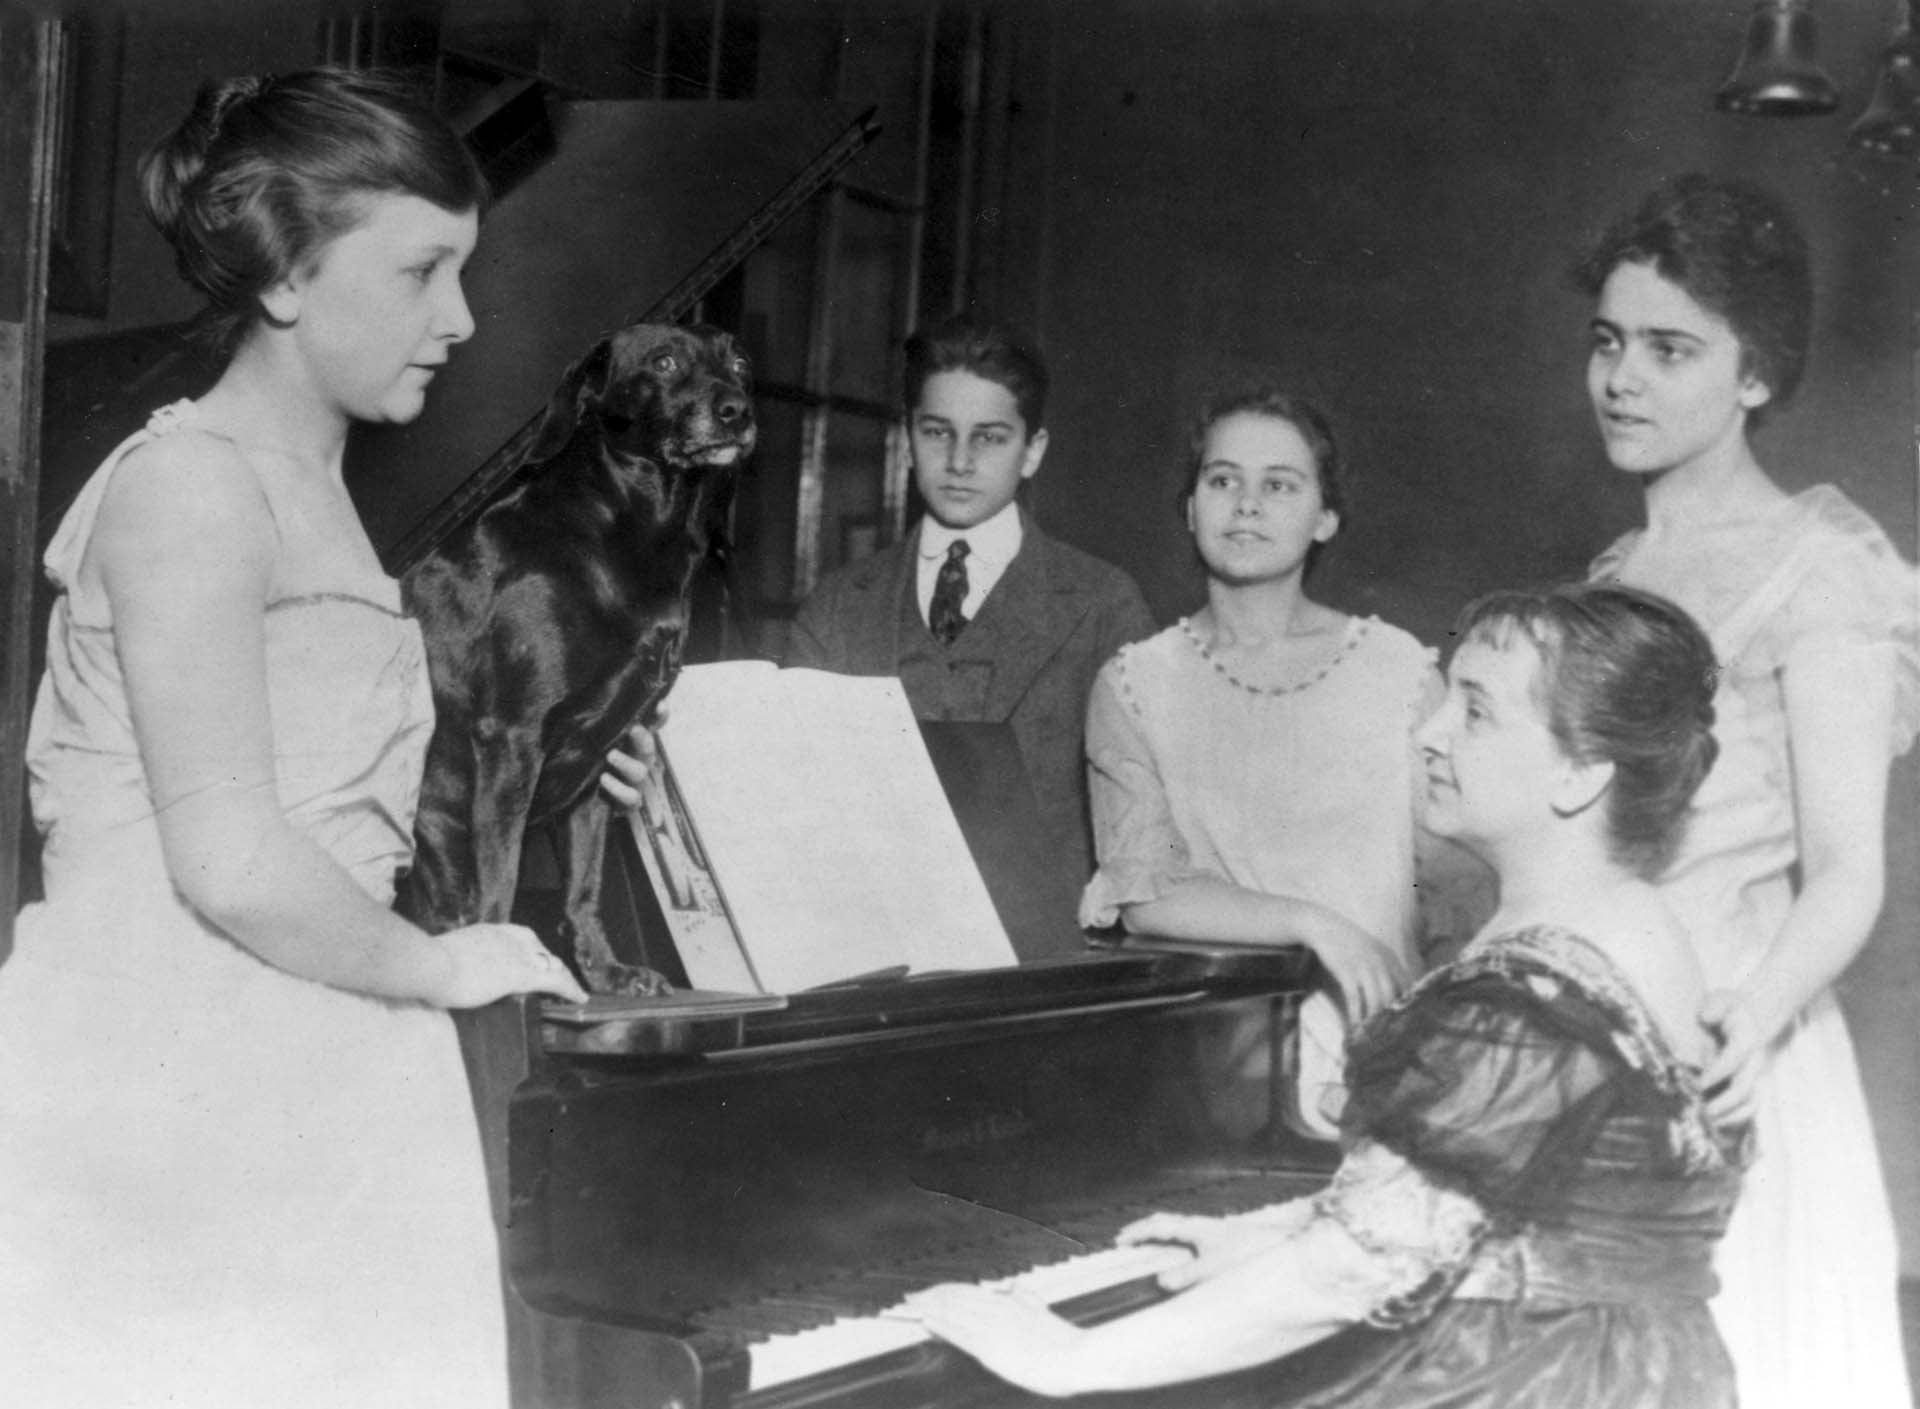 photo of McClintock family gathered around piano